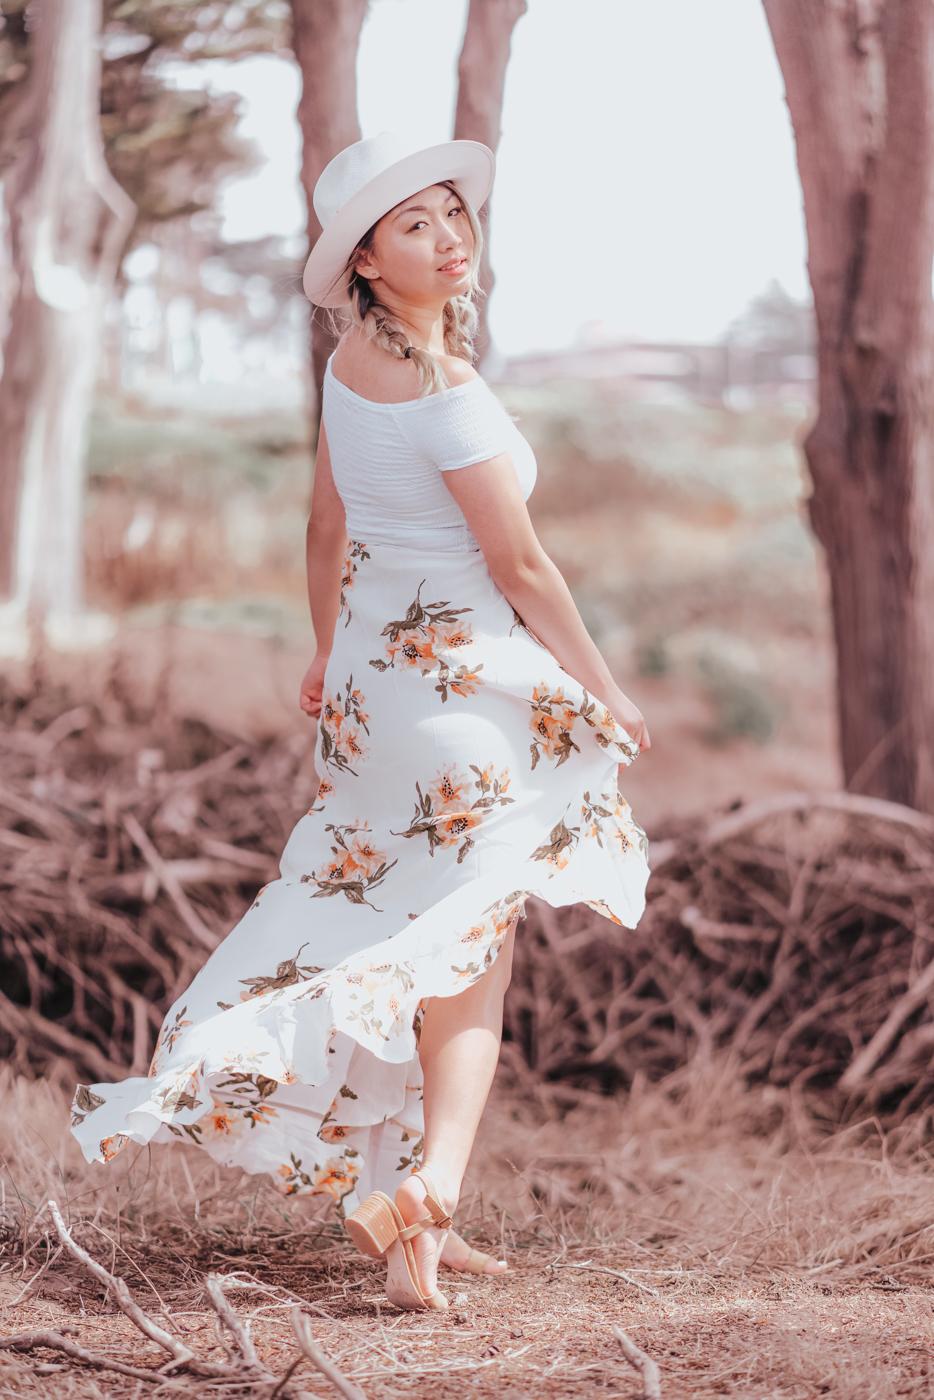 Flynn Skye Orange Blossoms Maxi Skirt | The Chic Diary